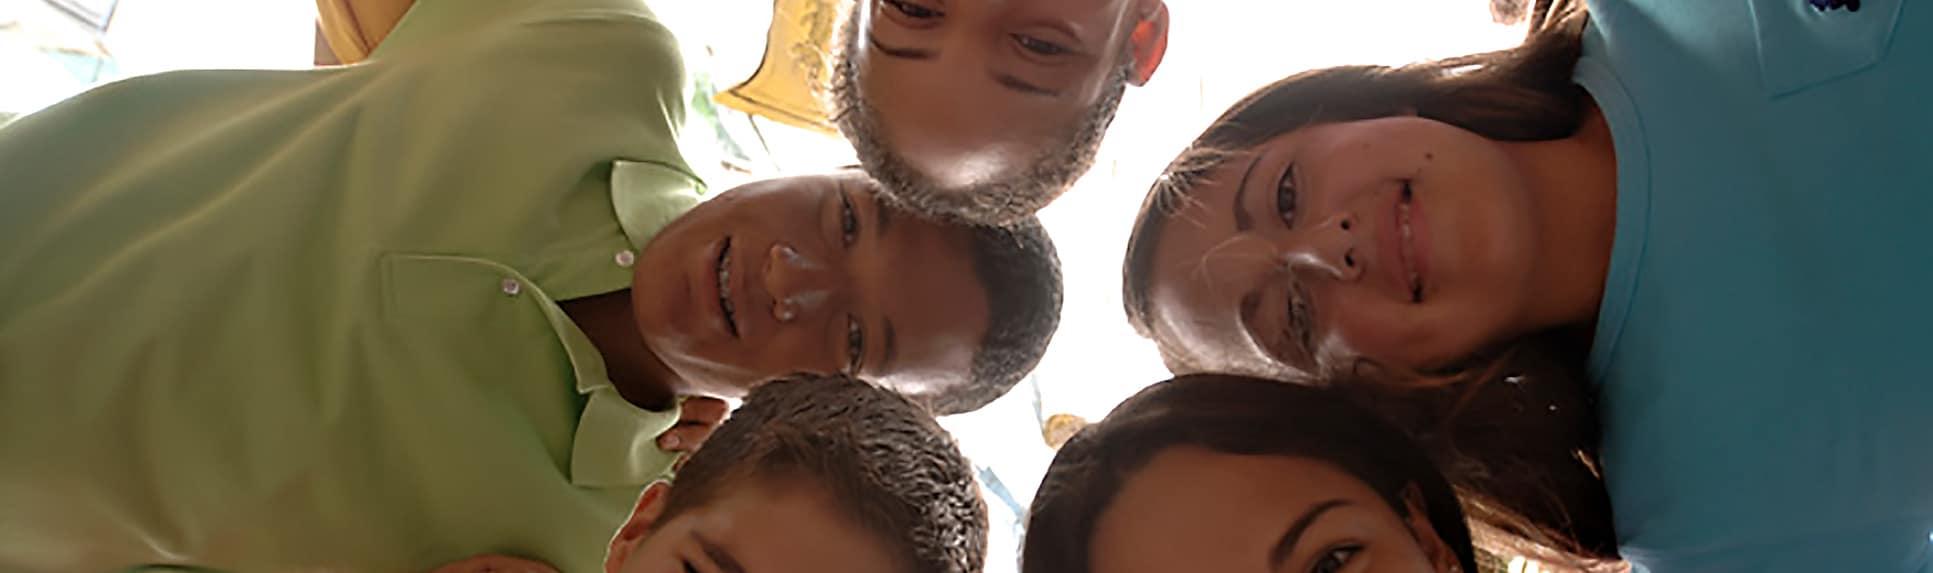 Smiling children in a huddle